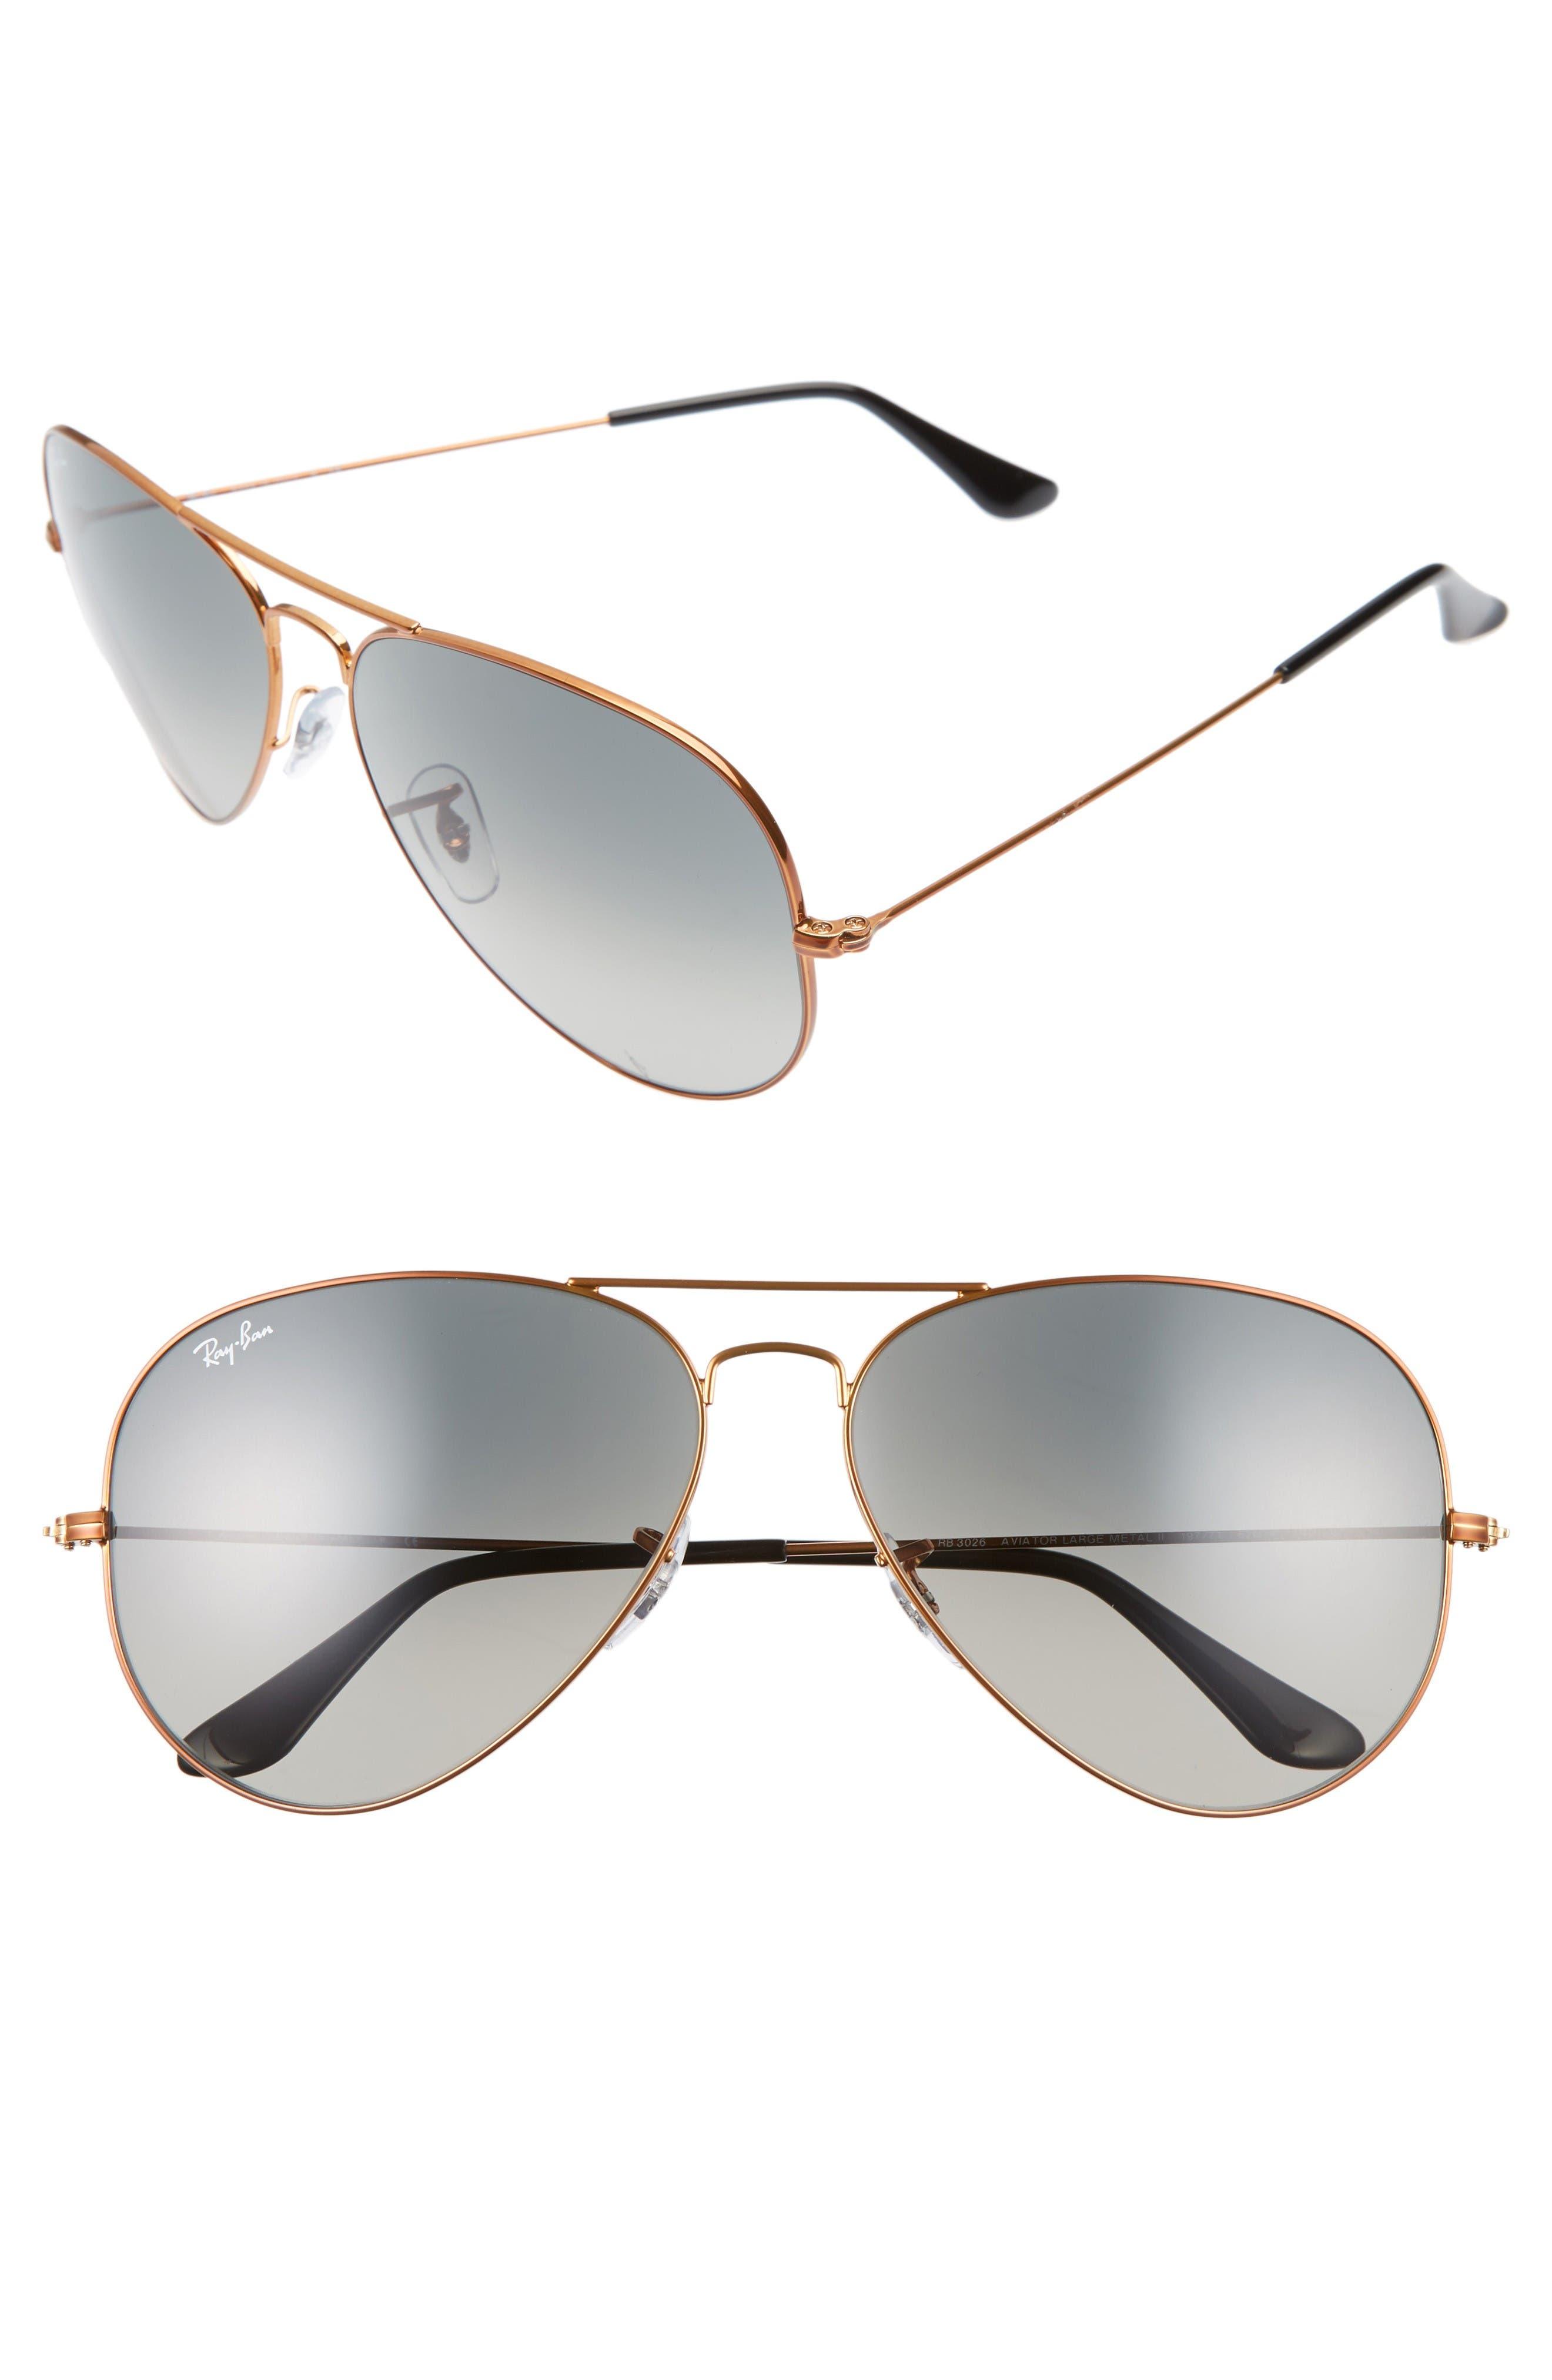 62mm Sunglasses,                         Main,                         color, Bronze